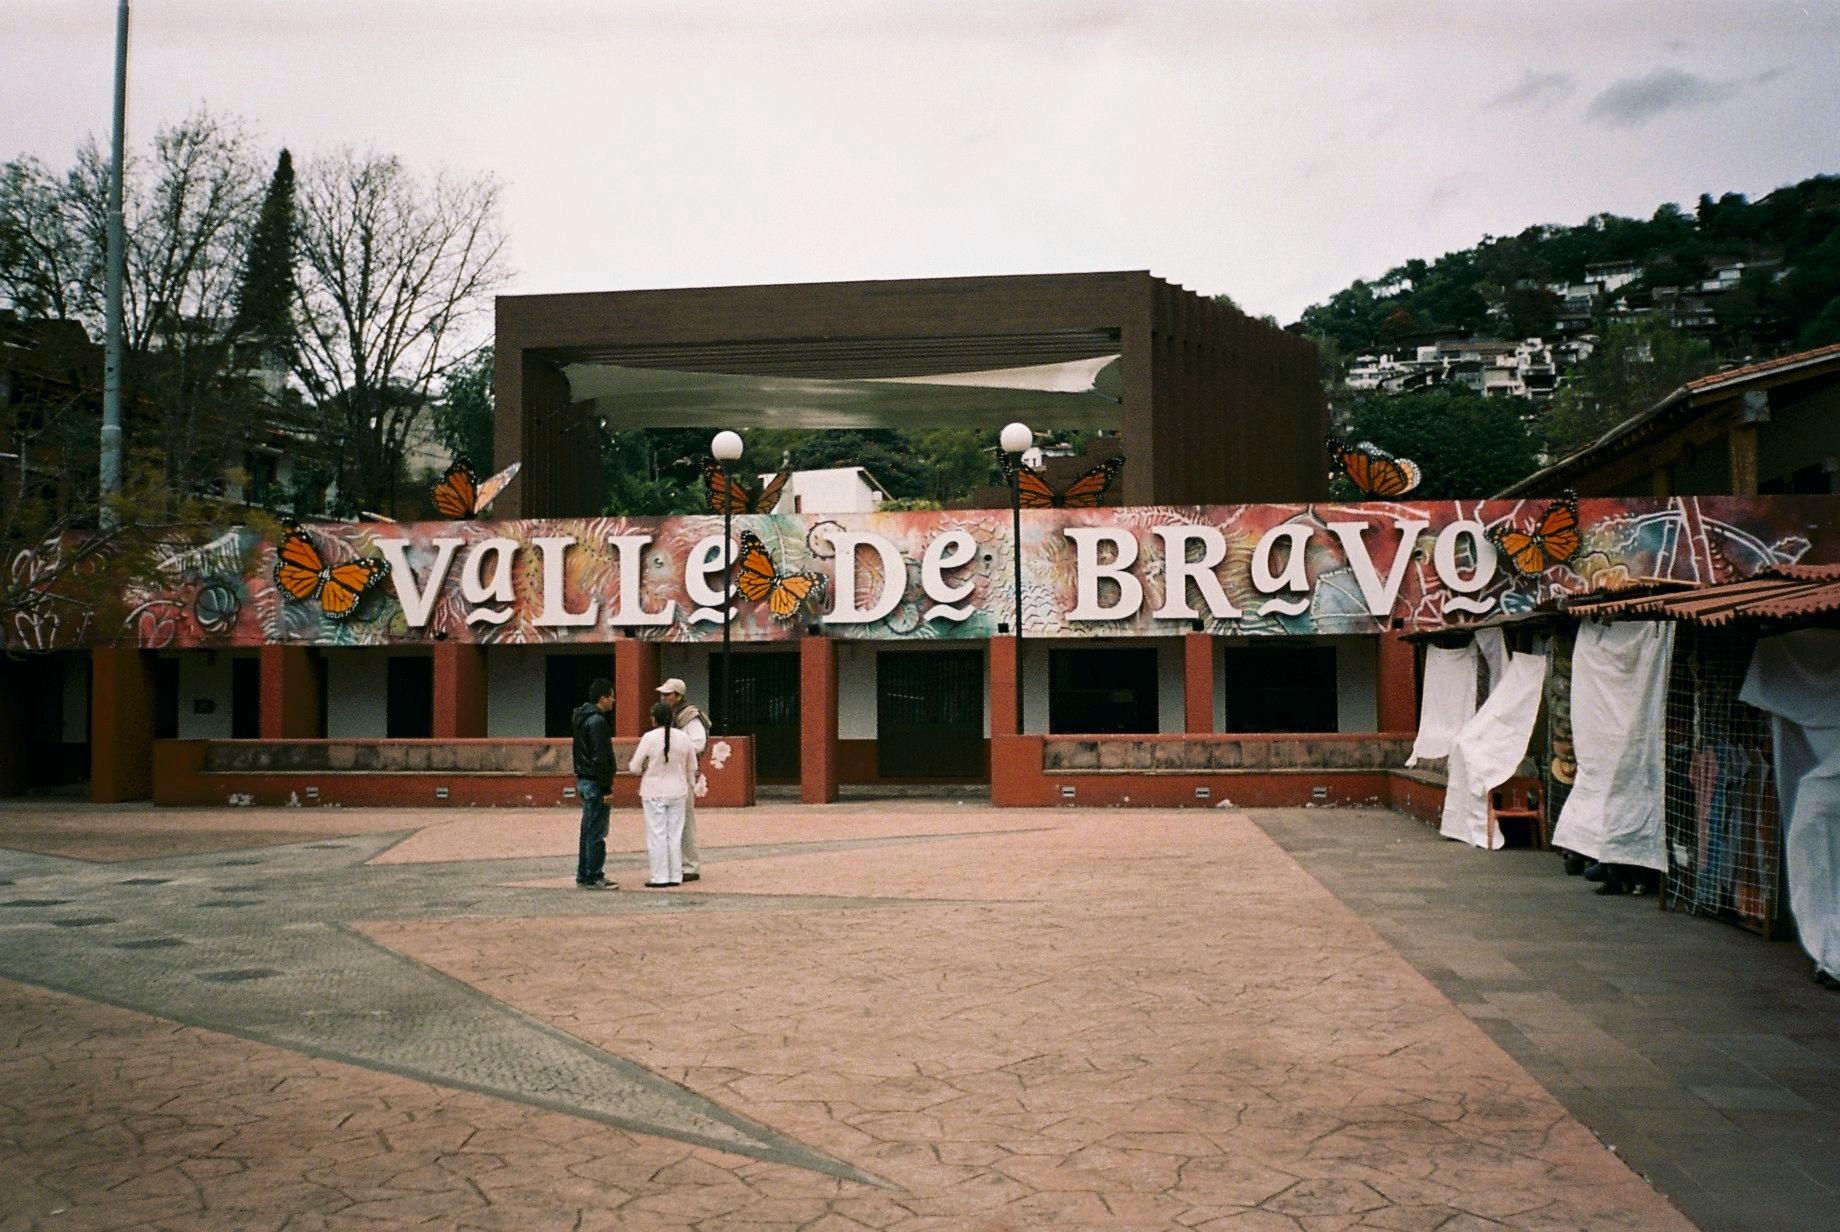 Valle De Bravo 01-2020 - 25 of 51